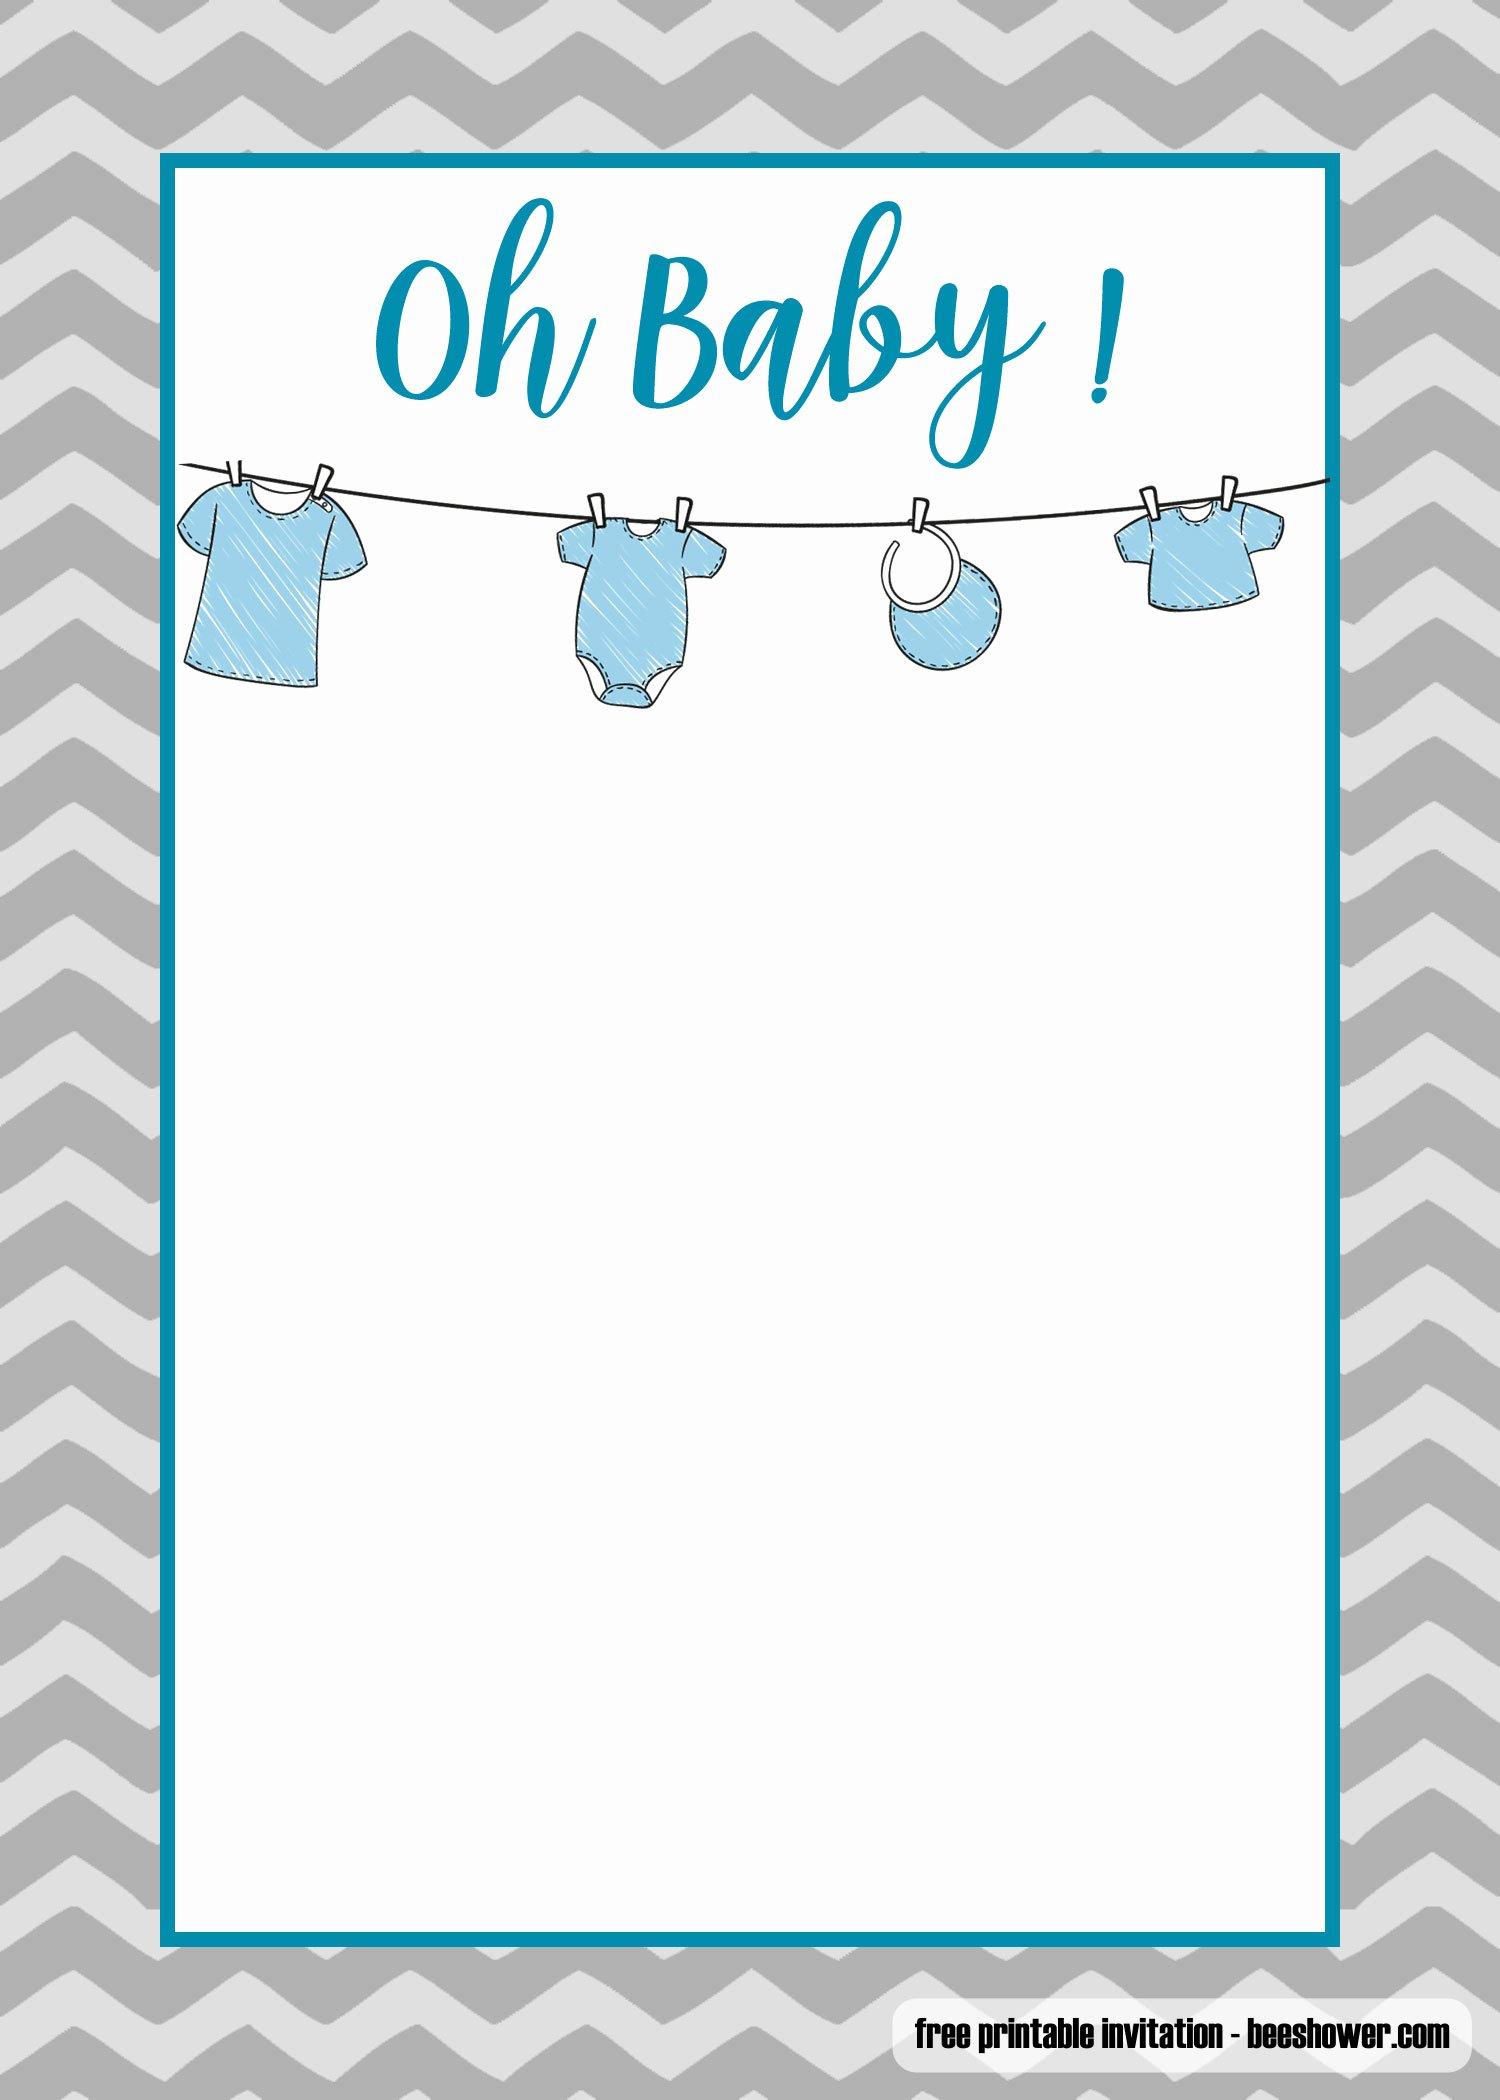 Free Printable Baby Onesie Template New Free Printable Esie Baby Shower Invitations Templates Free Invitation Templates Drevio